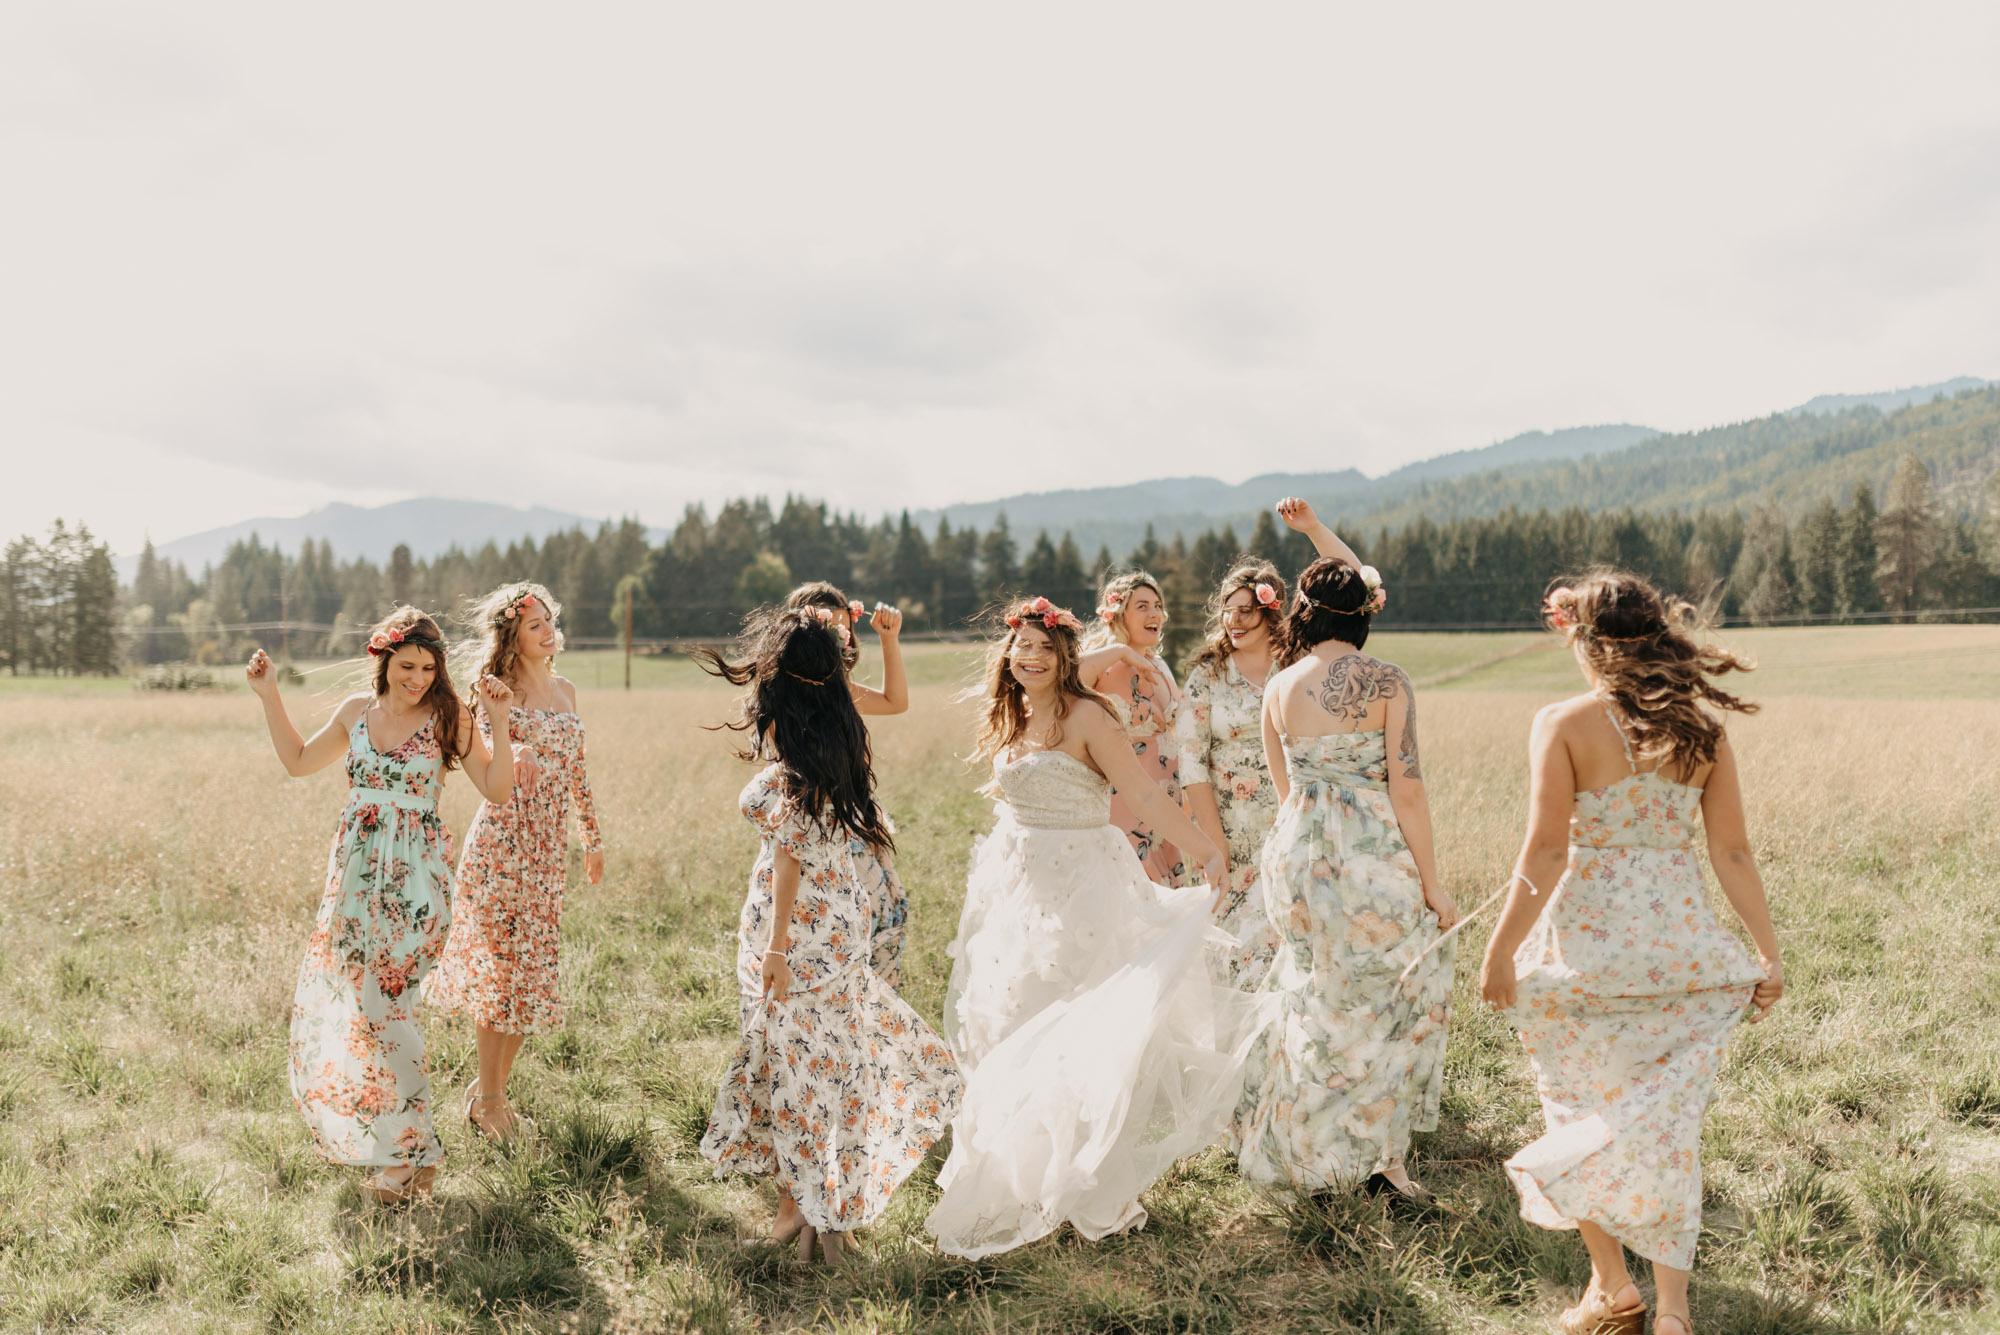 Bridal-Party-Free-People-Flower-Dresses-Washington-Wedding-8561.jpg